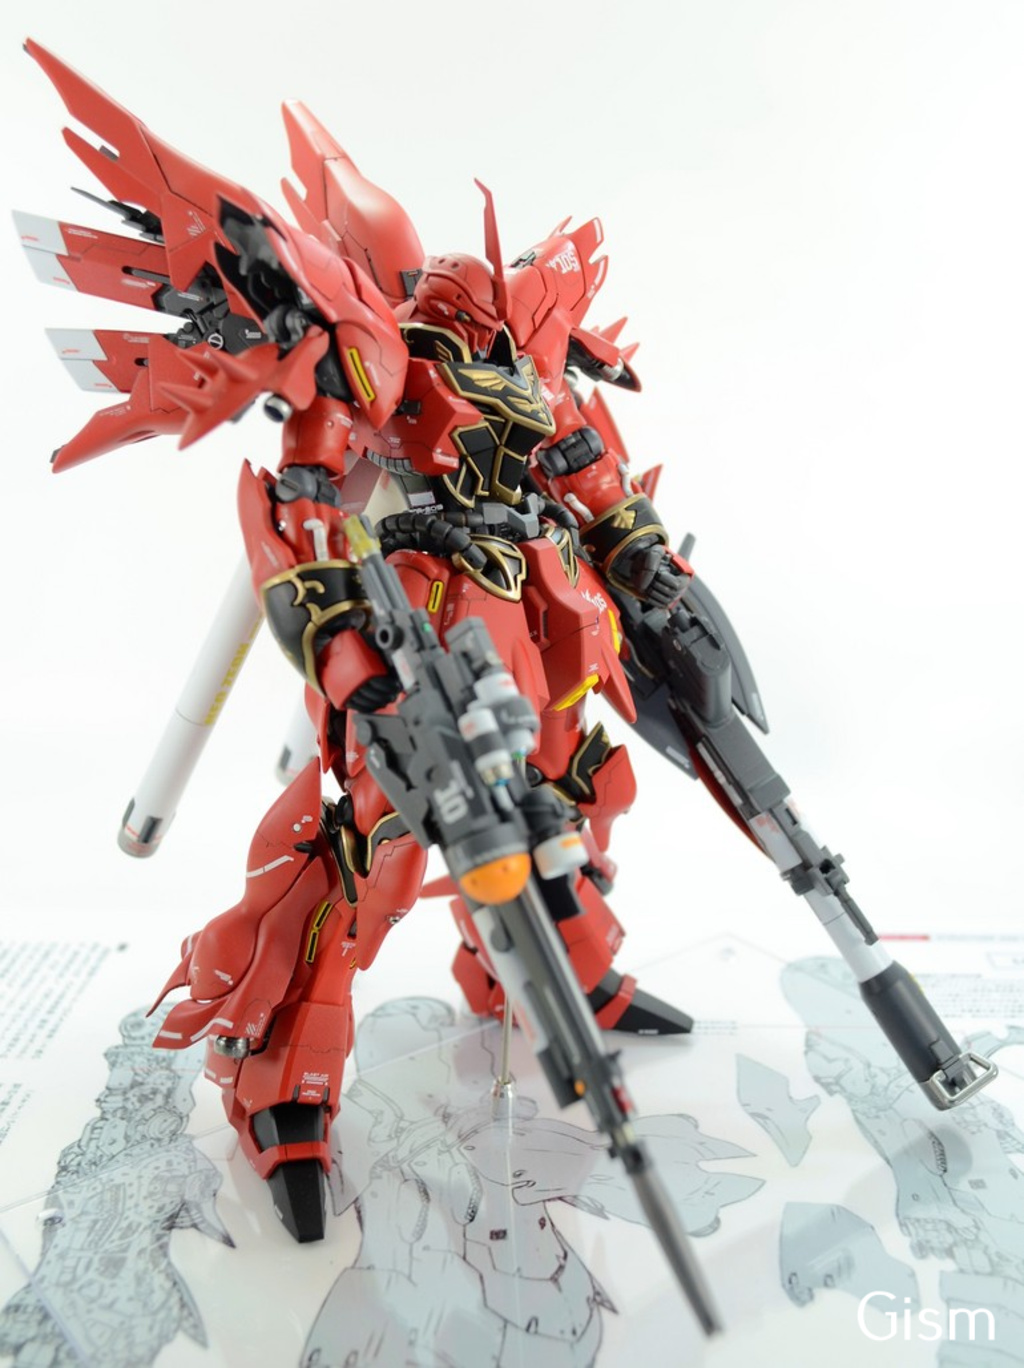 Custom Build: RG 1/144 MSN-06S Sinanju [Detailed]